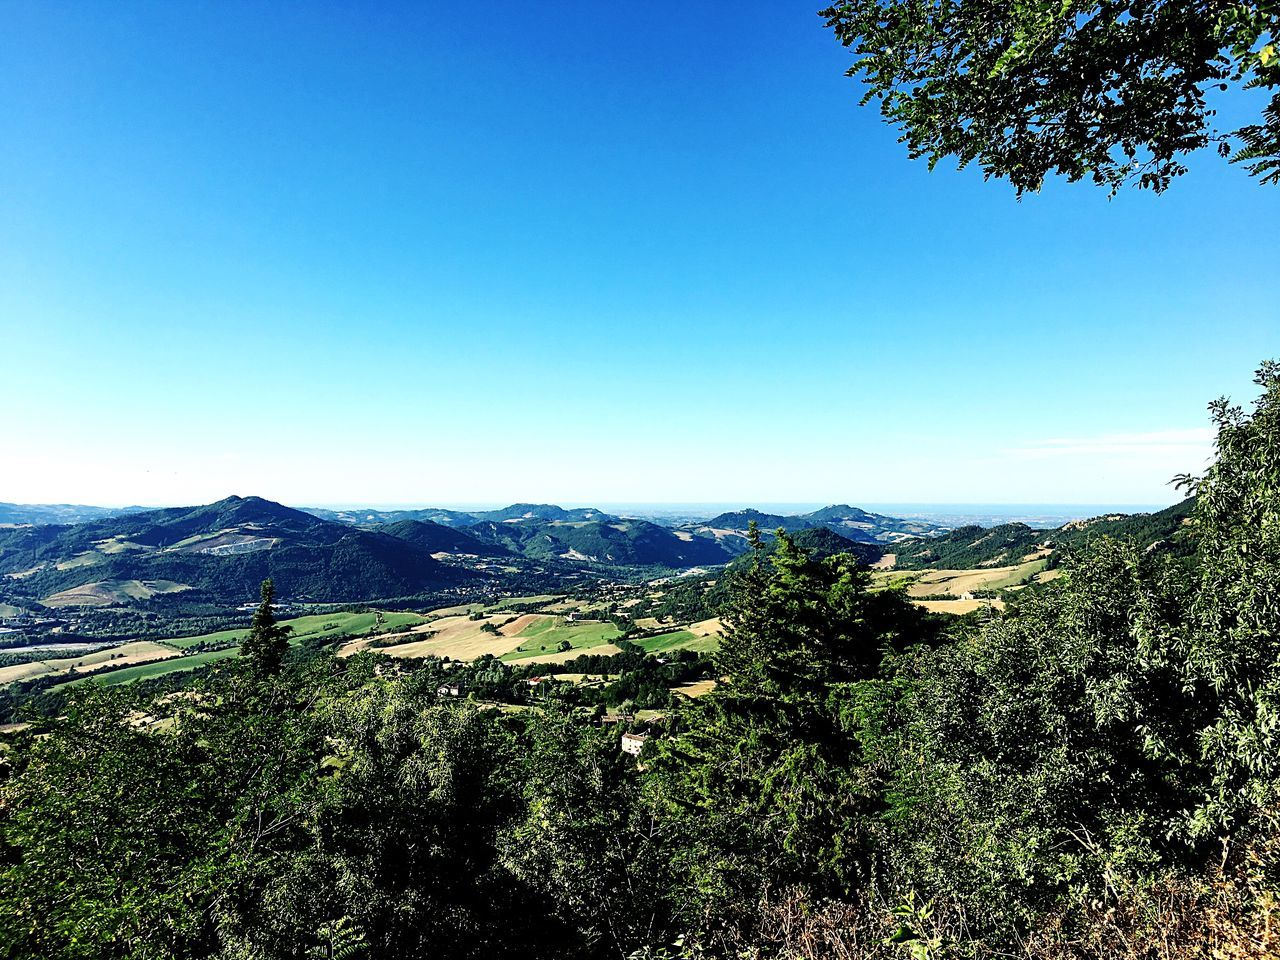 Sanleo Scenics Landscape Emiliaromagna Italy Valley Valmarecchia Montefeltro